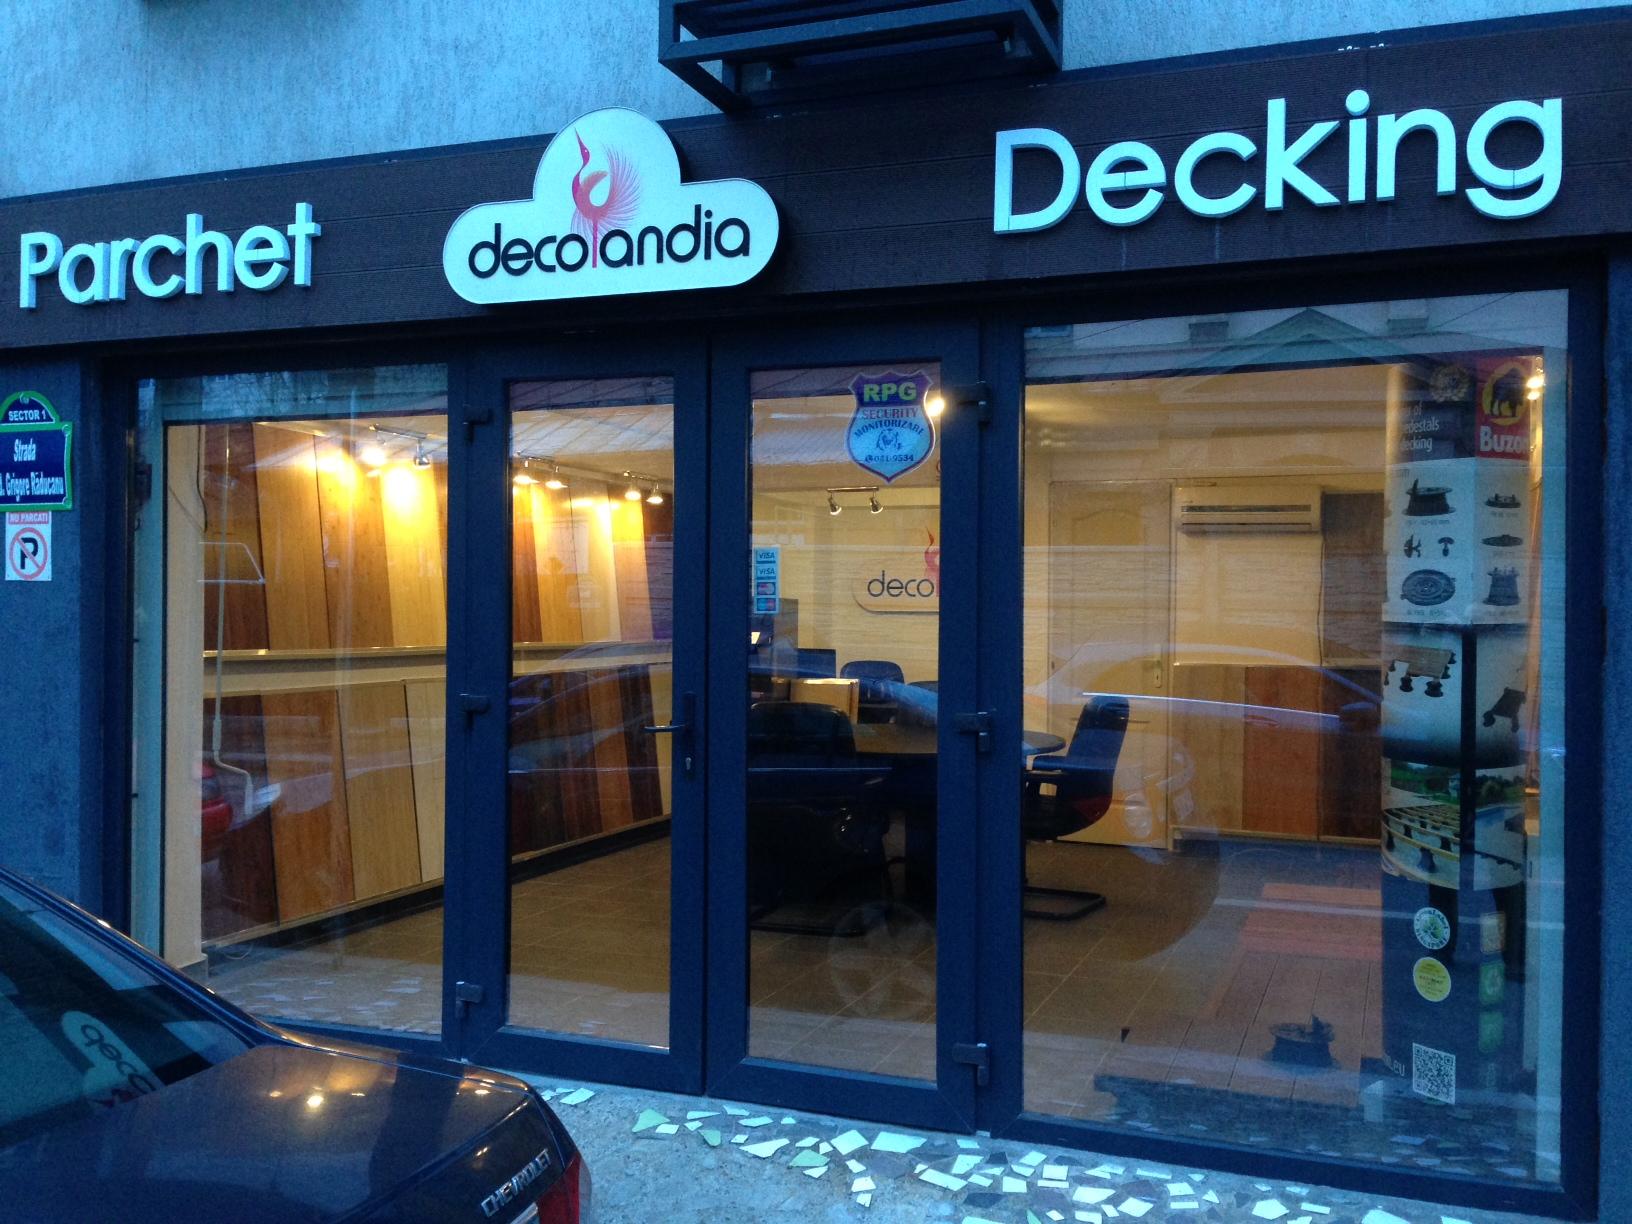 Magazin de parchet inaugurat de Decolandia in Bucuresti - Magazin de parchet inaugurat de Decolandia in